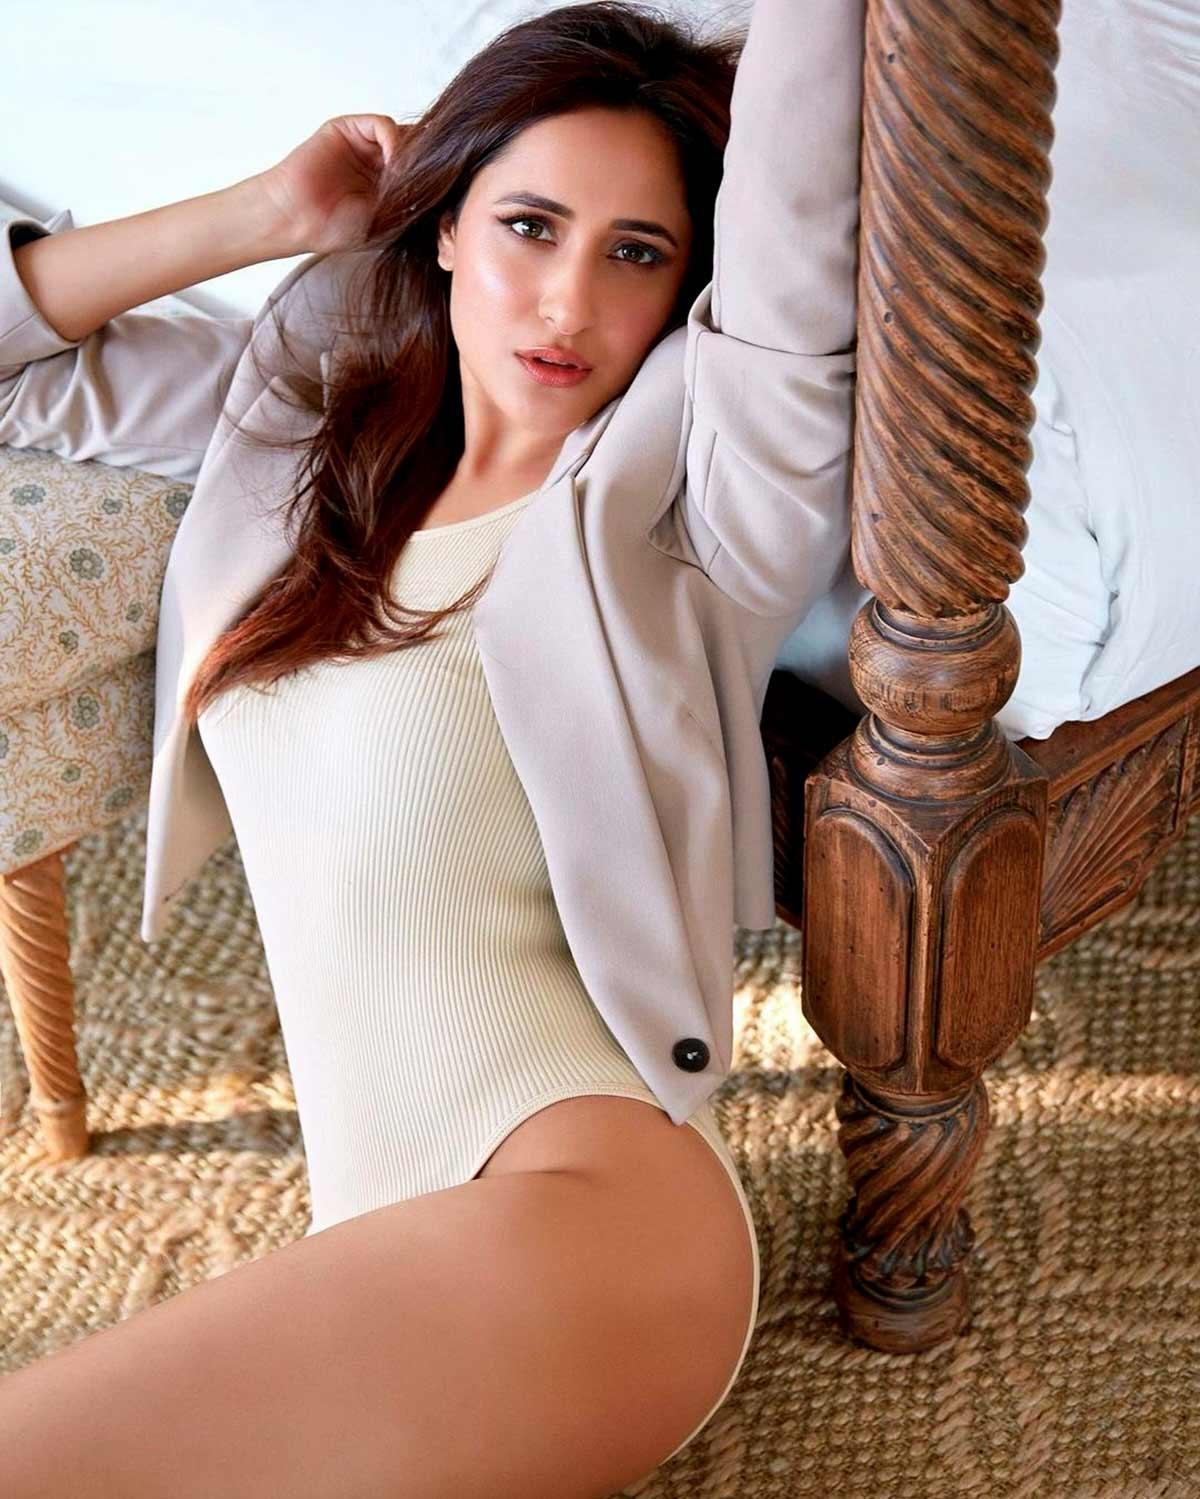 Pic Talk: Pragya Jaiswal radiates zest in glamorous photoshoot